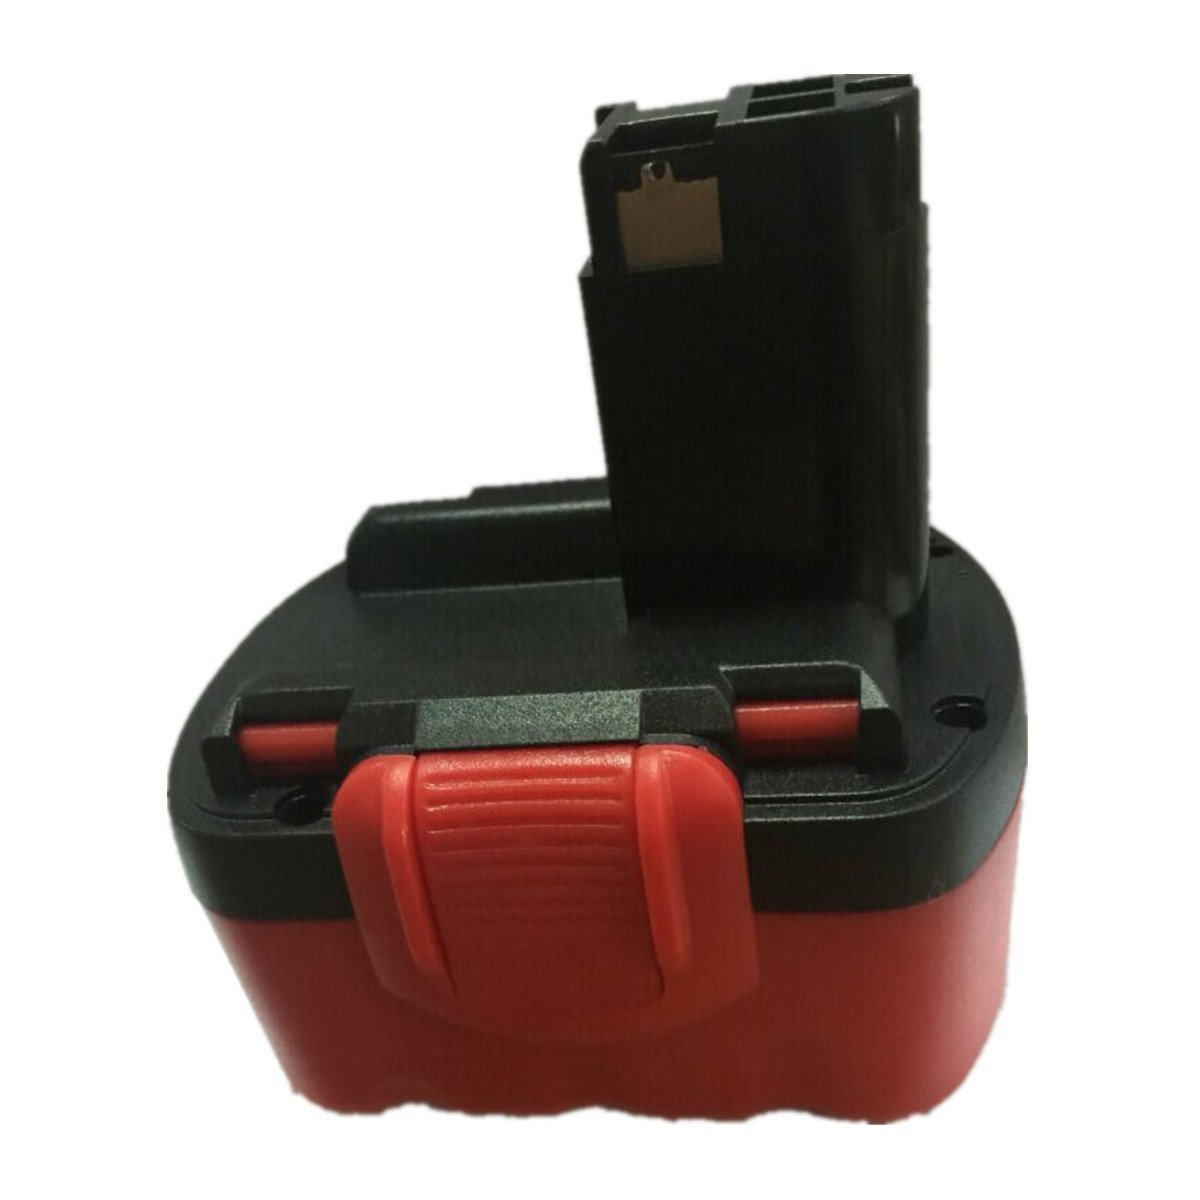 ZTHY 1500mAh power tool battery for Bosch 2 607 335 534 BAT038 BAT140 BAT159 BAT040 BAT041 GDR GDS 14.4V Cordless Drill